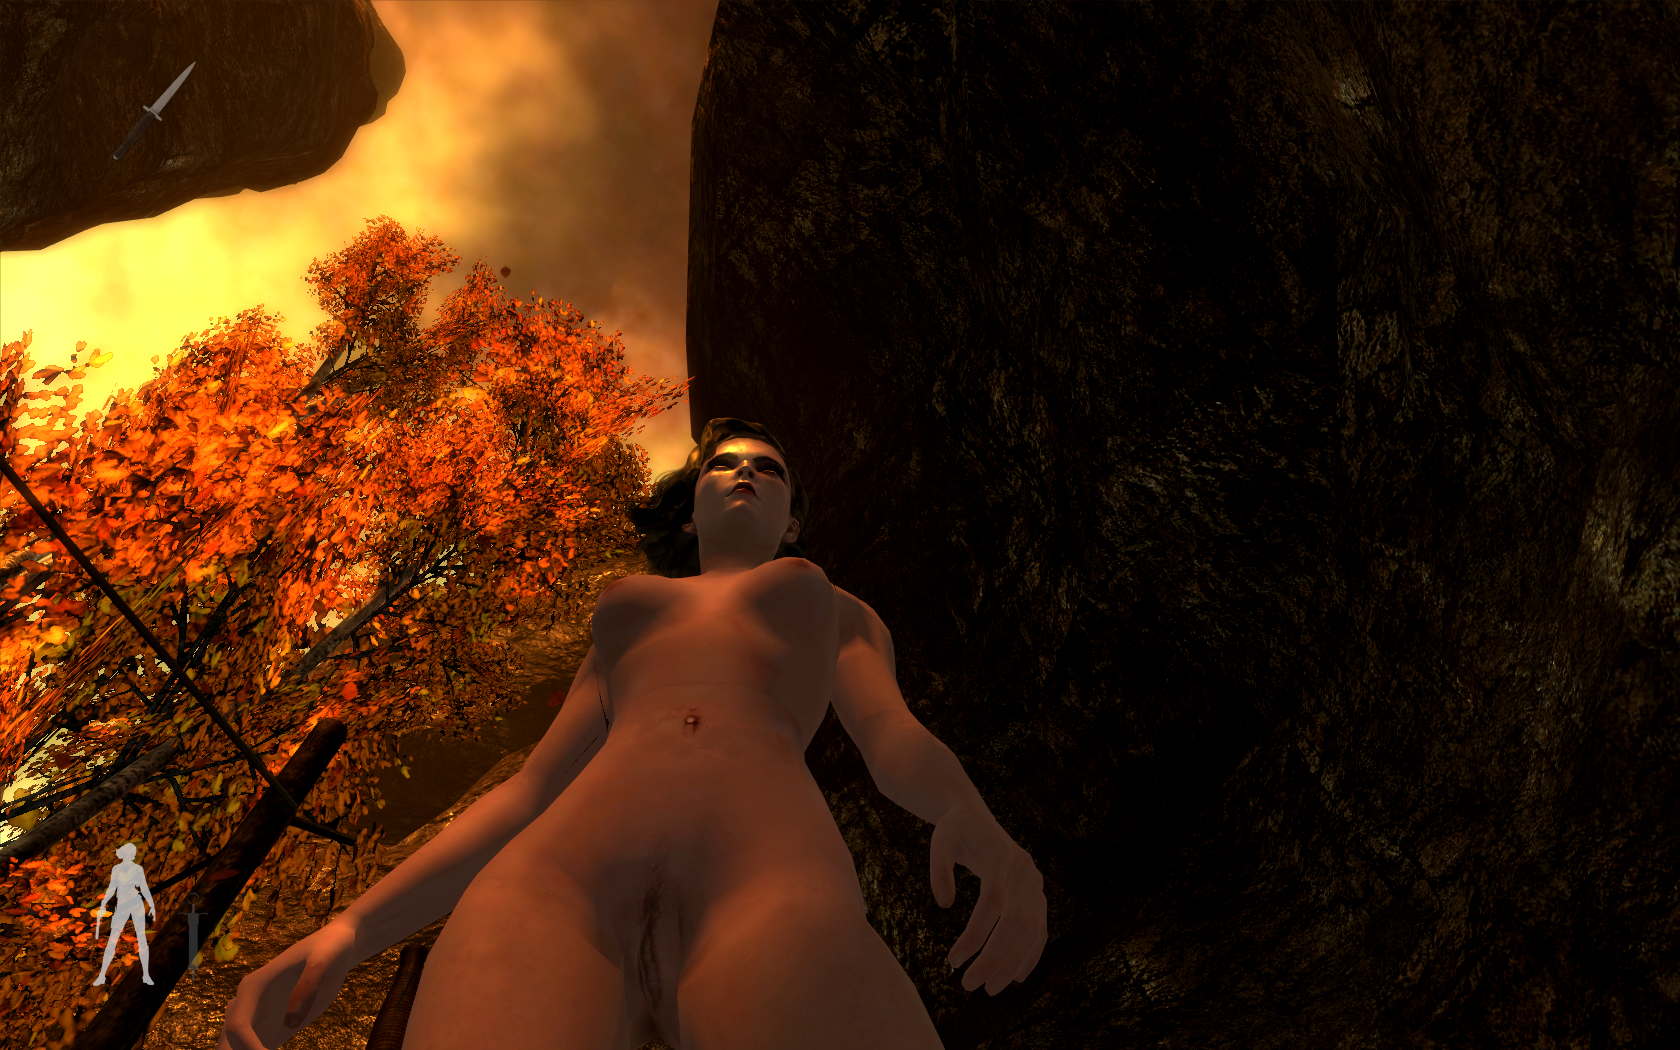 Assassins creed nude mod